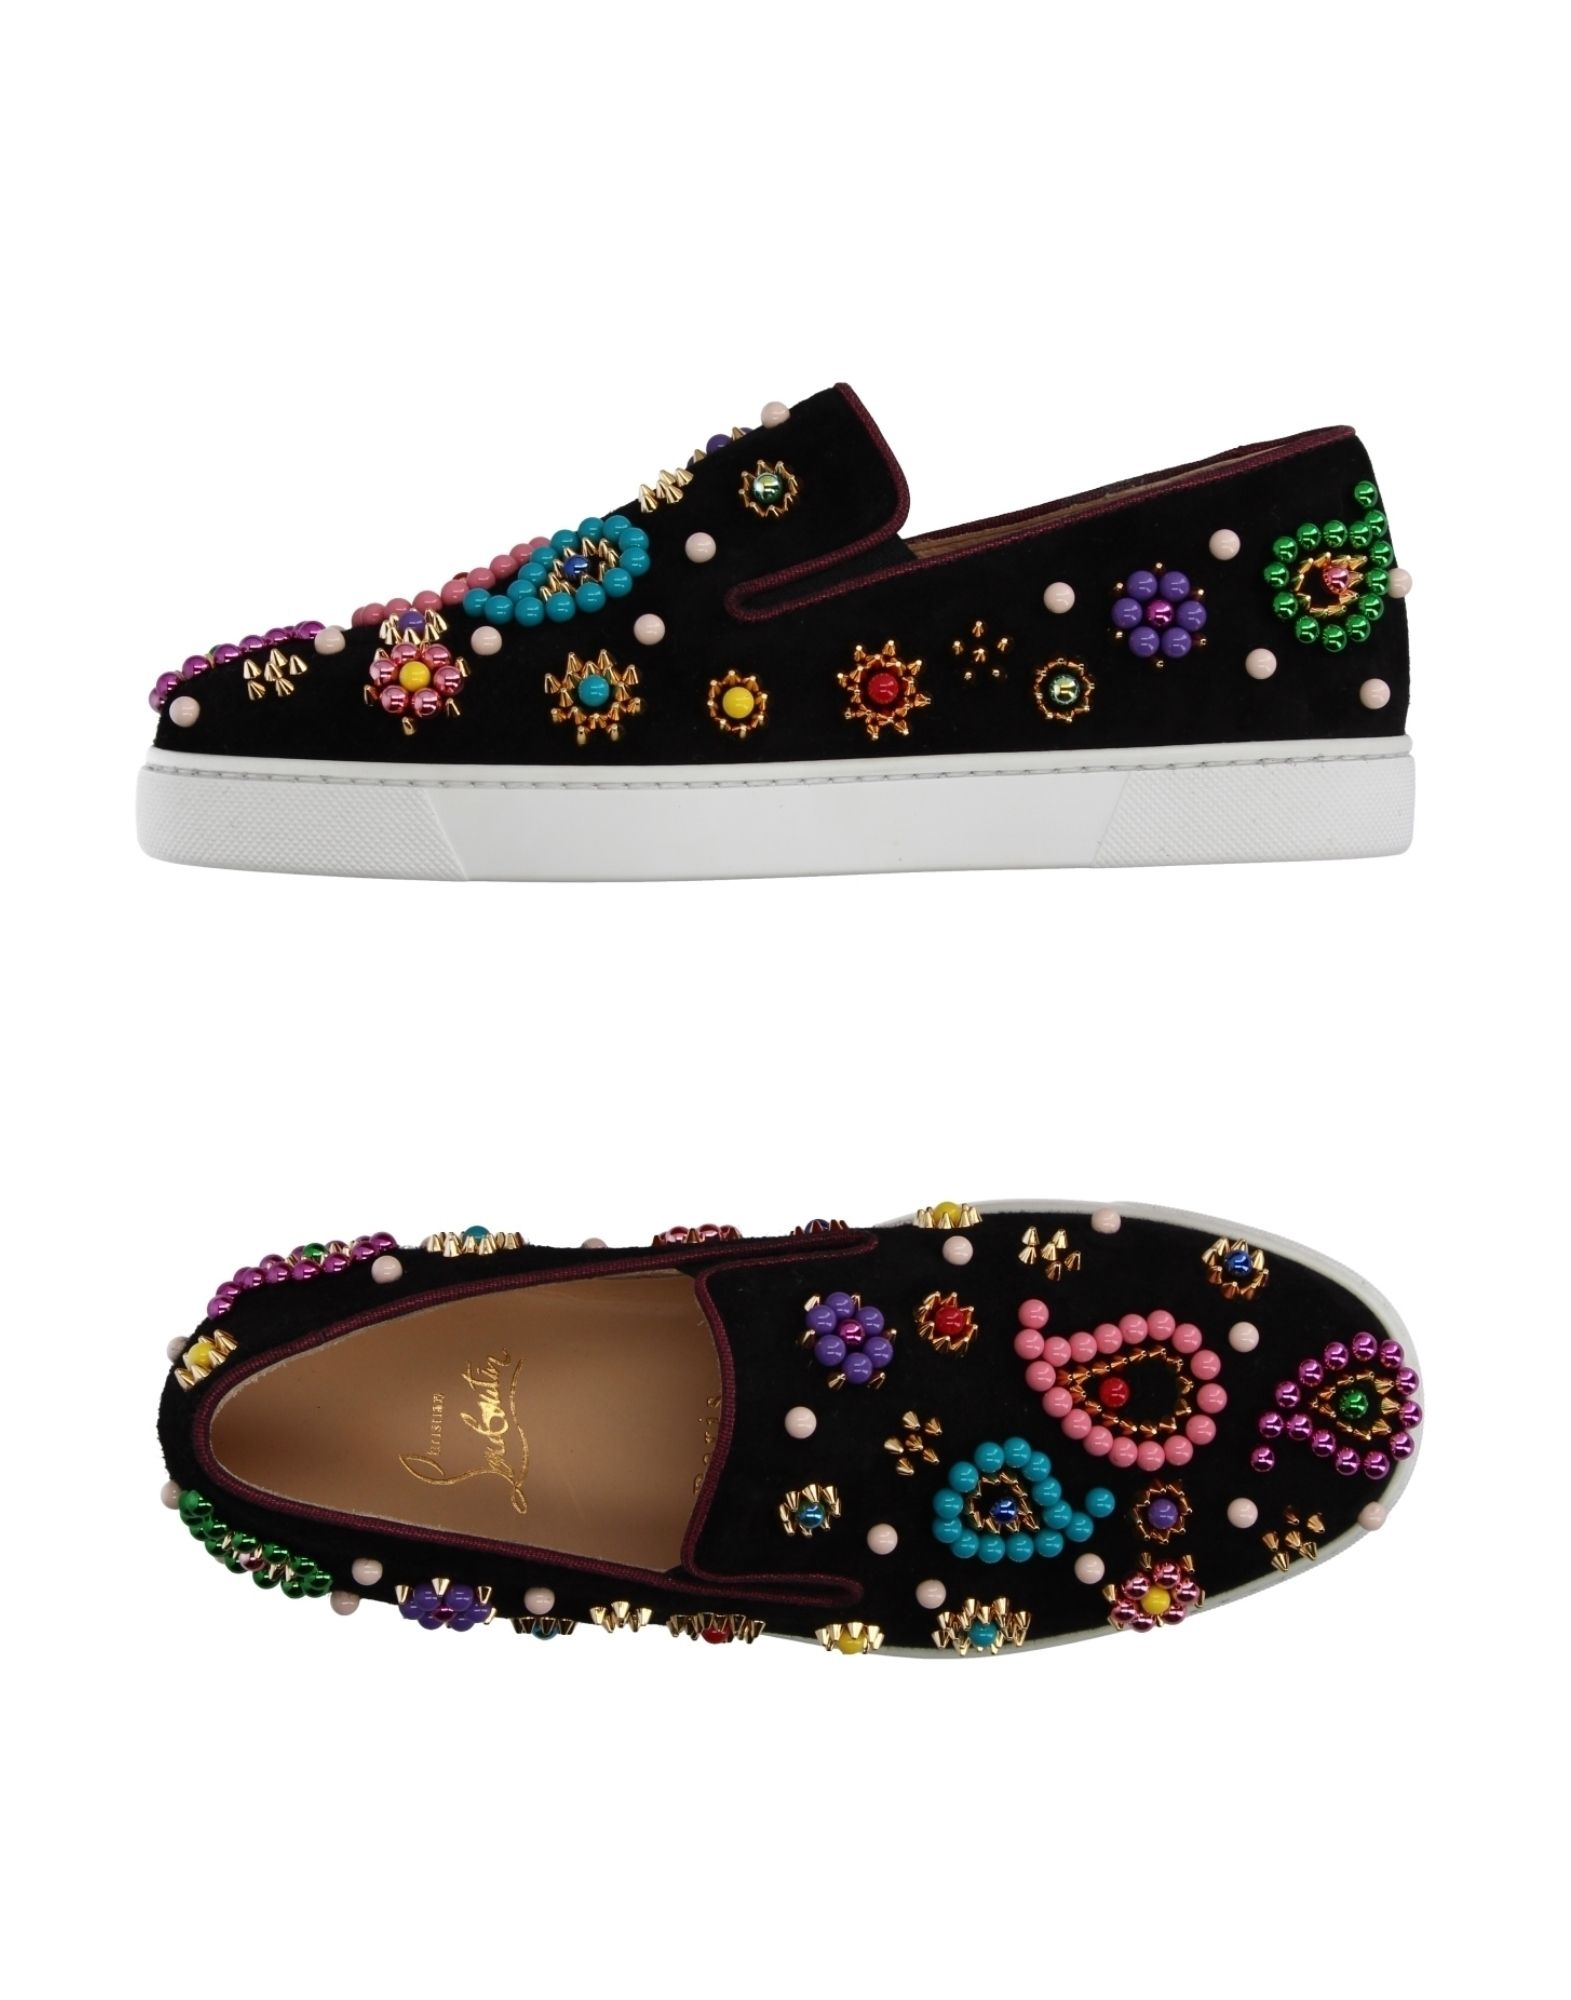 49c720b2cbe CHRISTIAN LOUBOUTIN Sneakers - Footwear | YOOX.COM